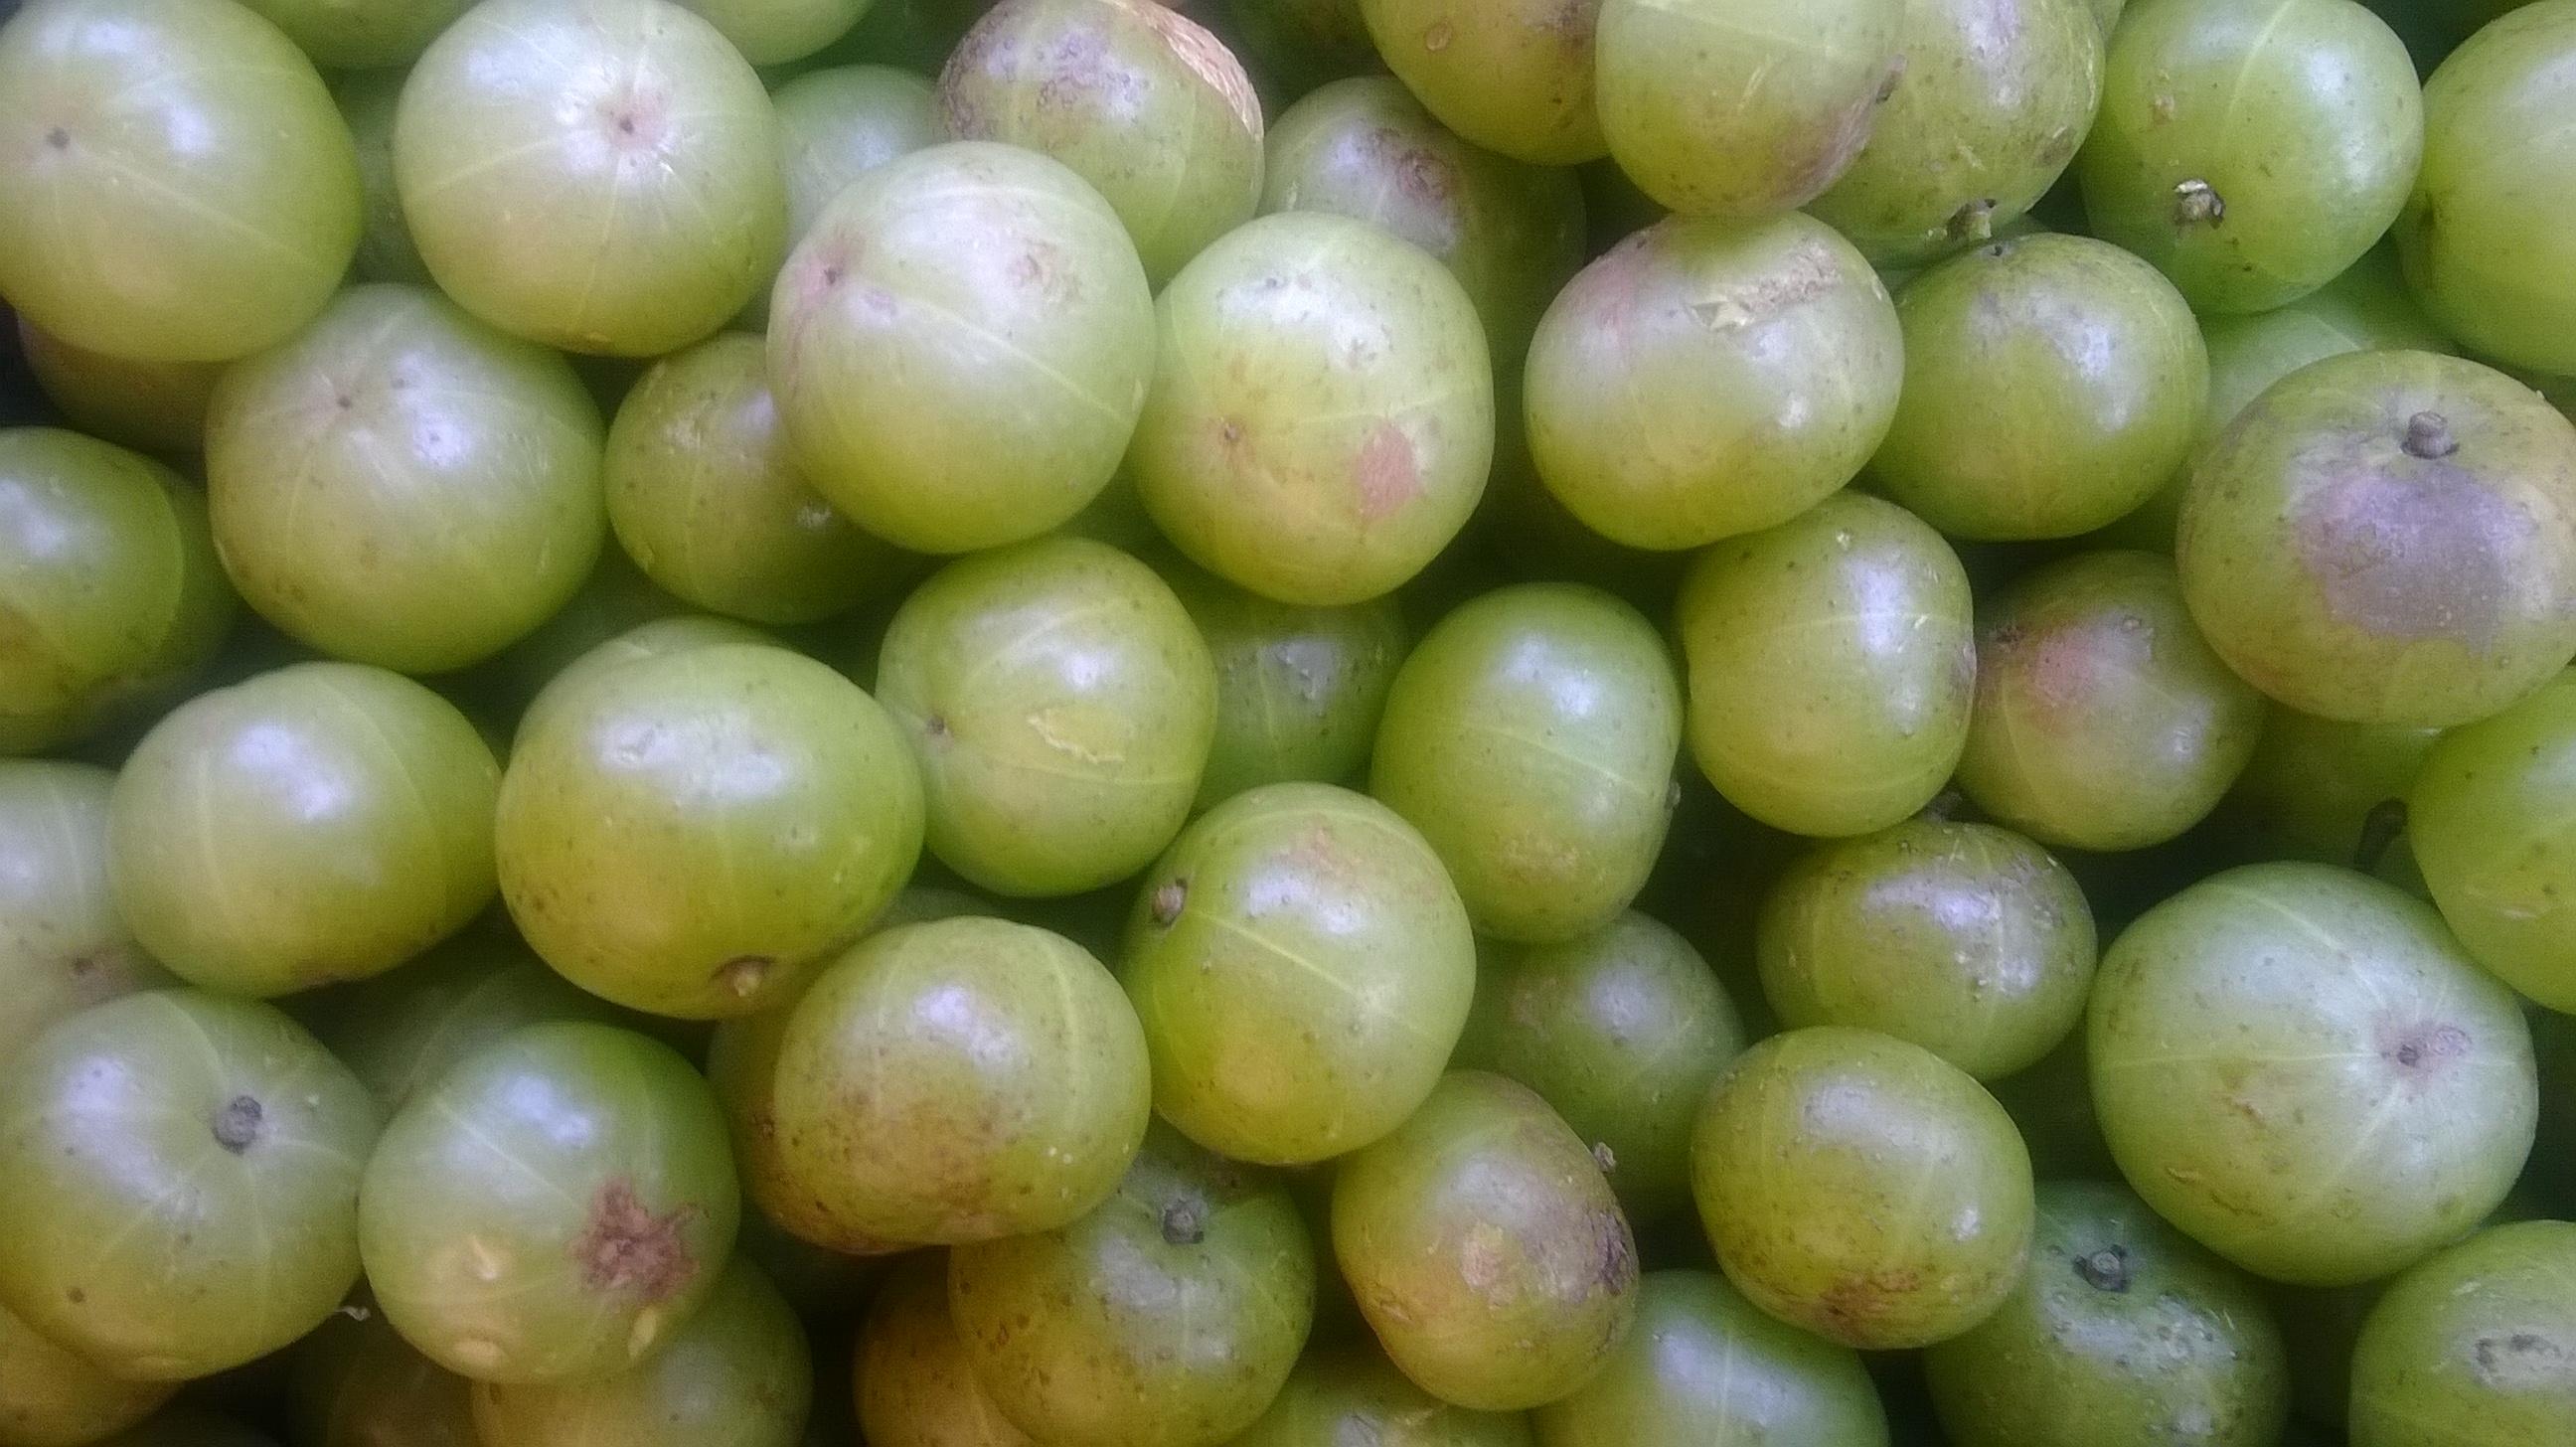 Phyllanthus emblica fruit 02.jpg